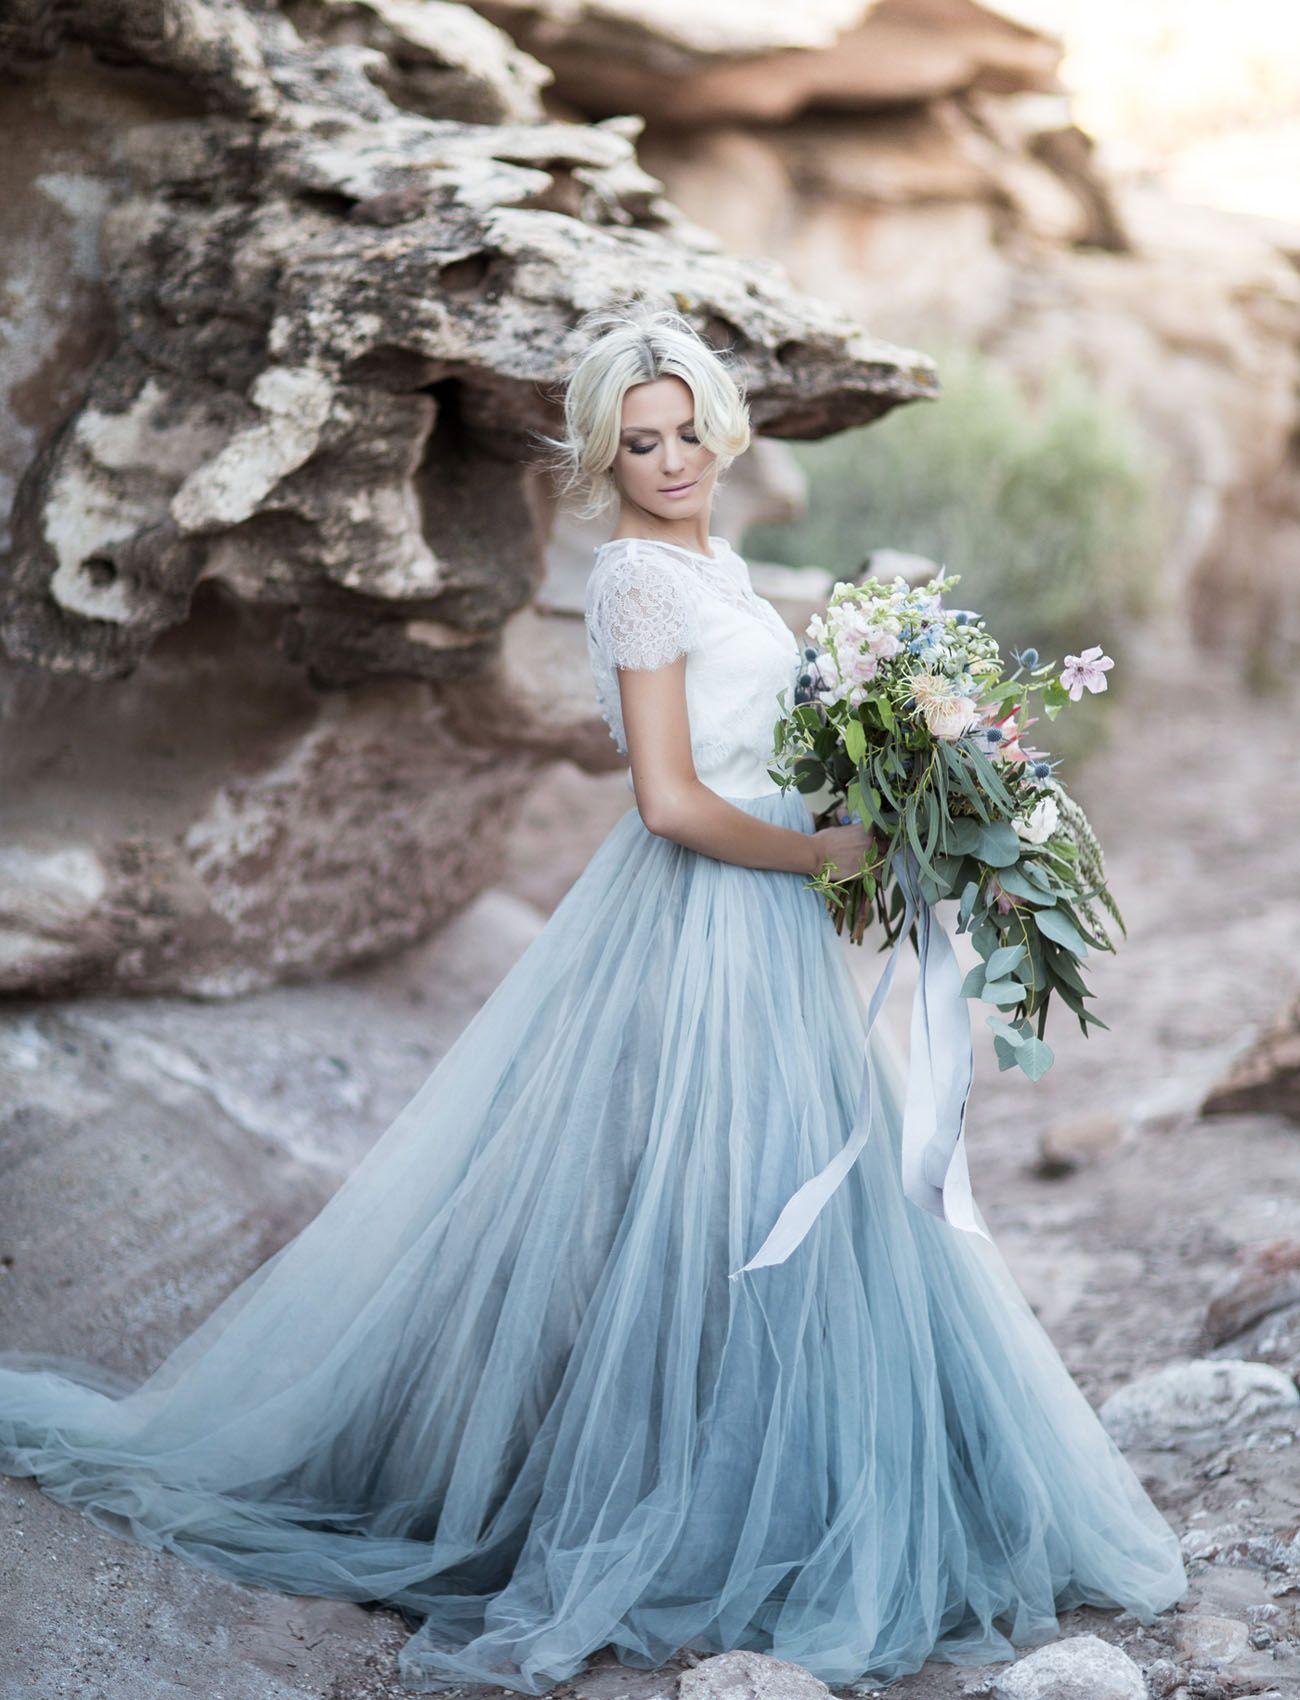 Wedding Dress Colors